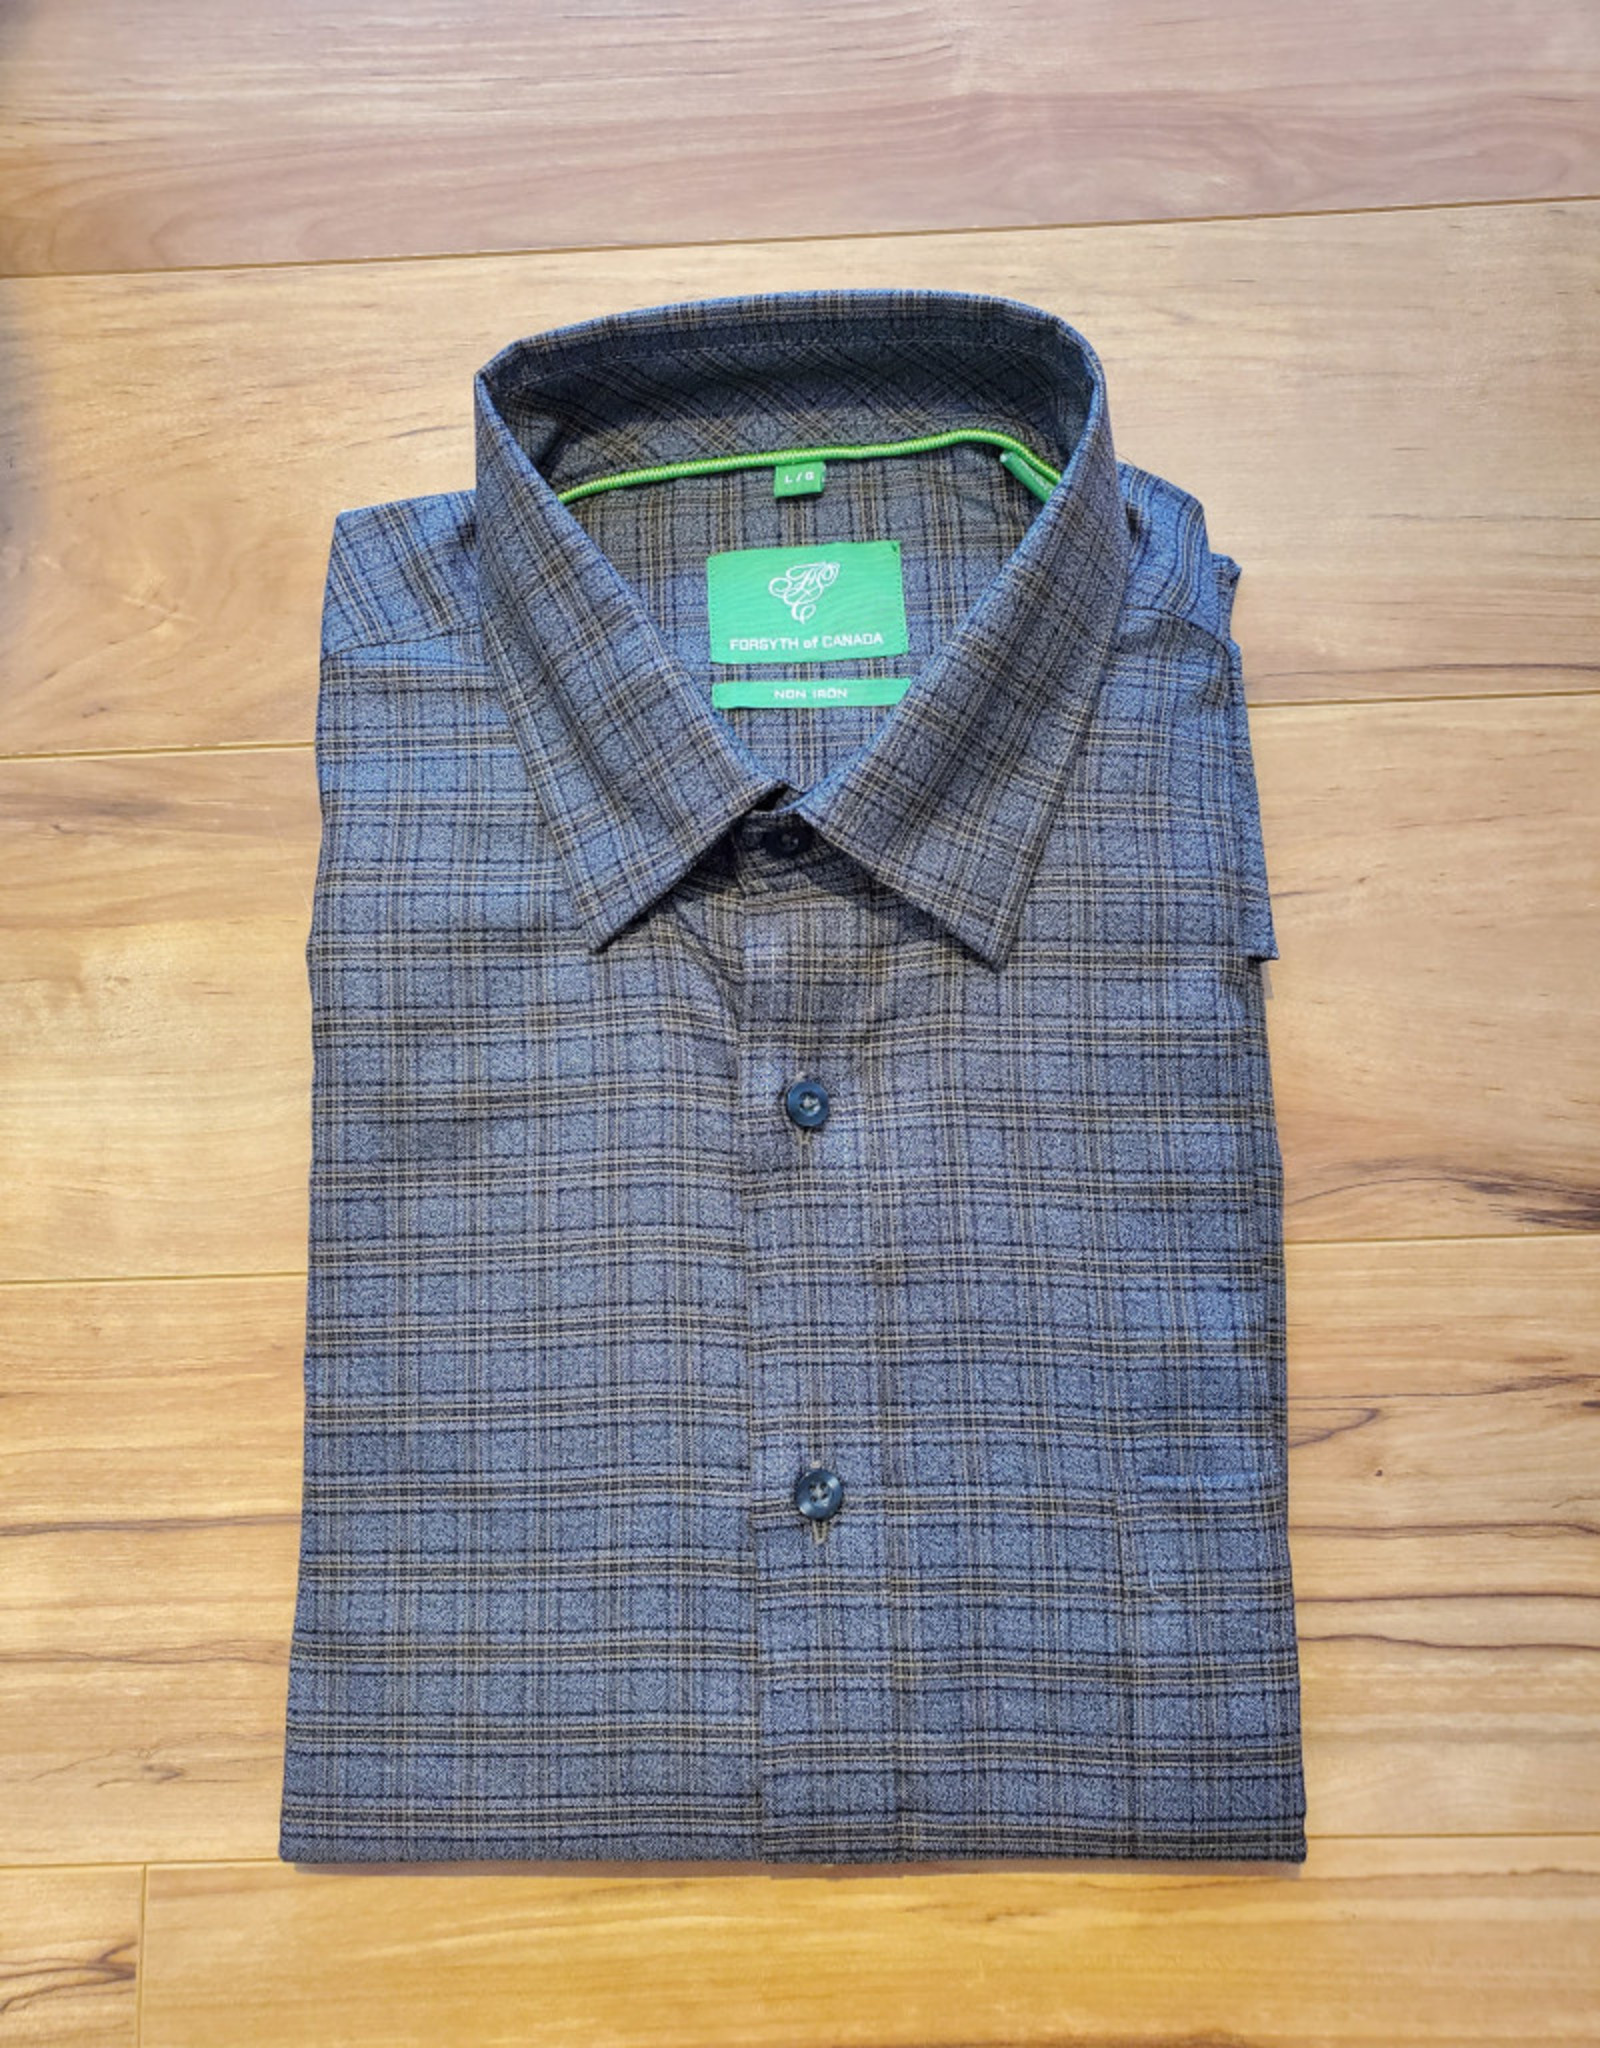 Forsyth Forsyth Long Sleeve Button Down - Jasper Olive Check